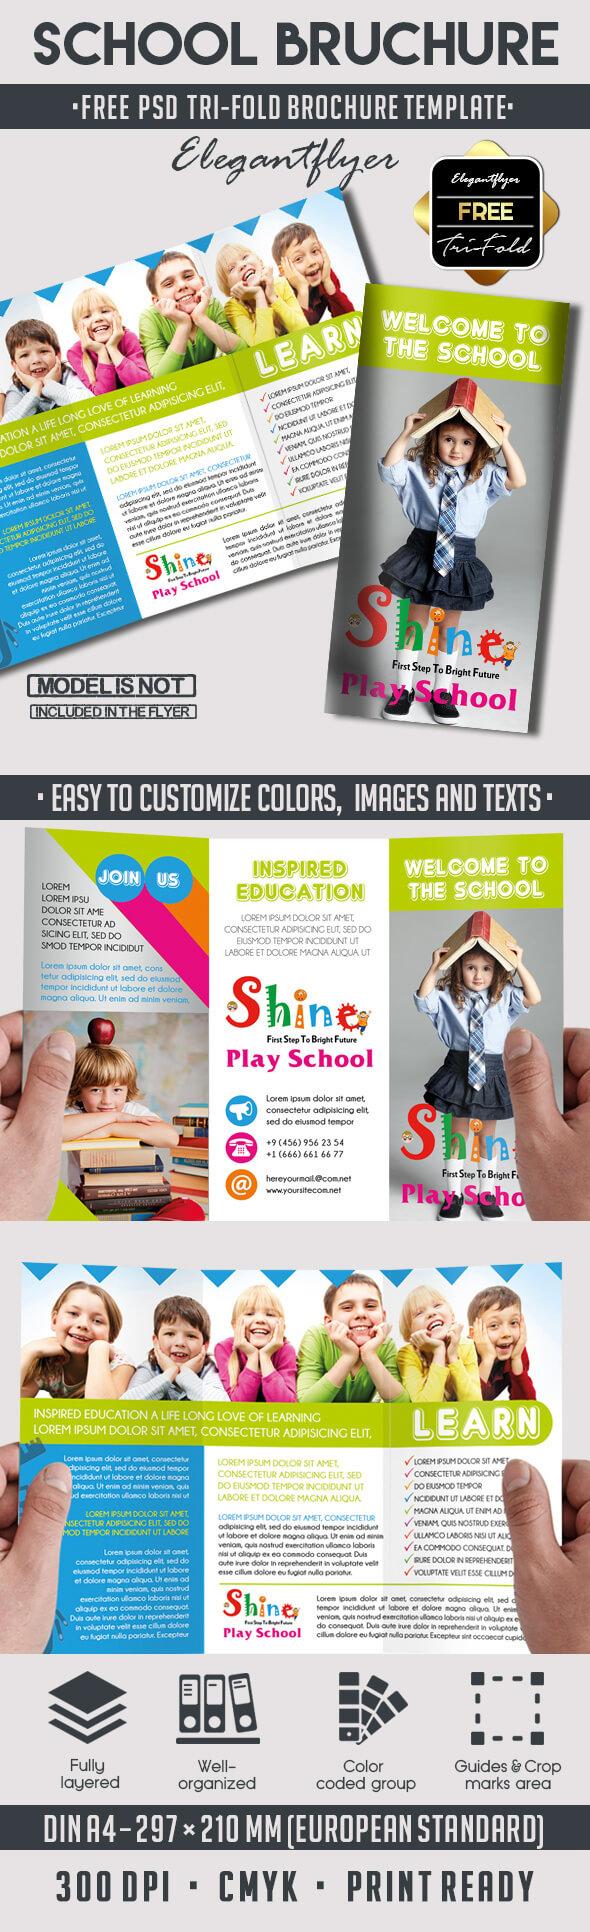 School – Free Psd Tri Fold Psd Brochure Template On Behance Regarding Play School Brochure Templates